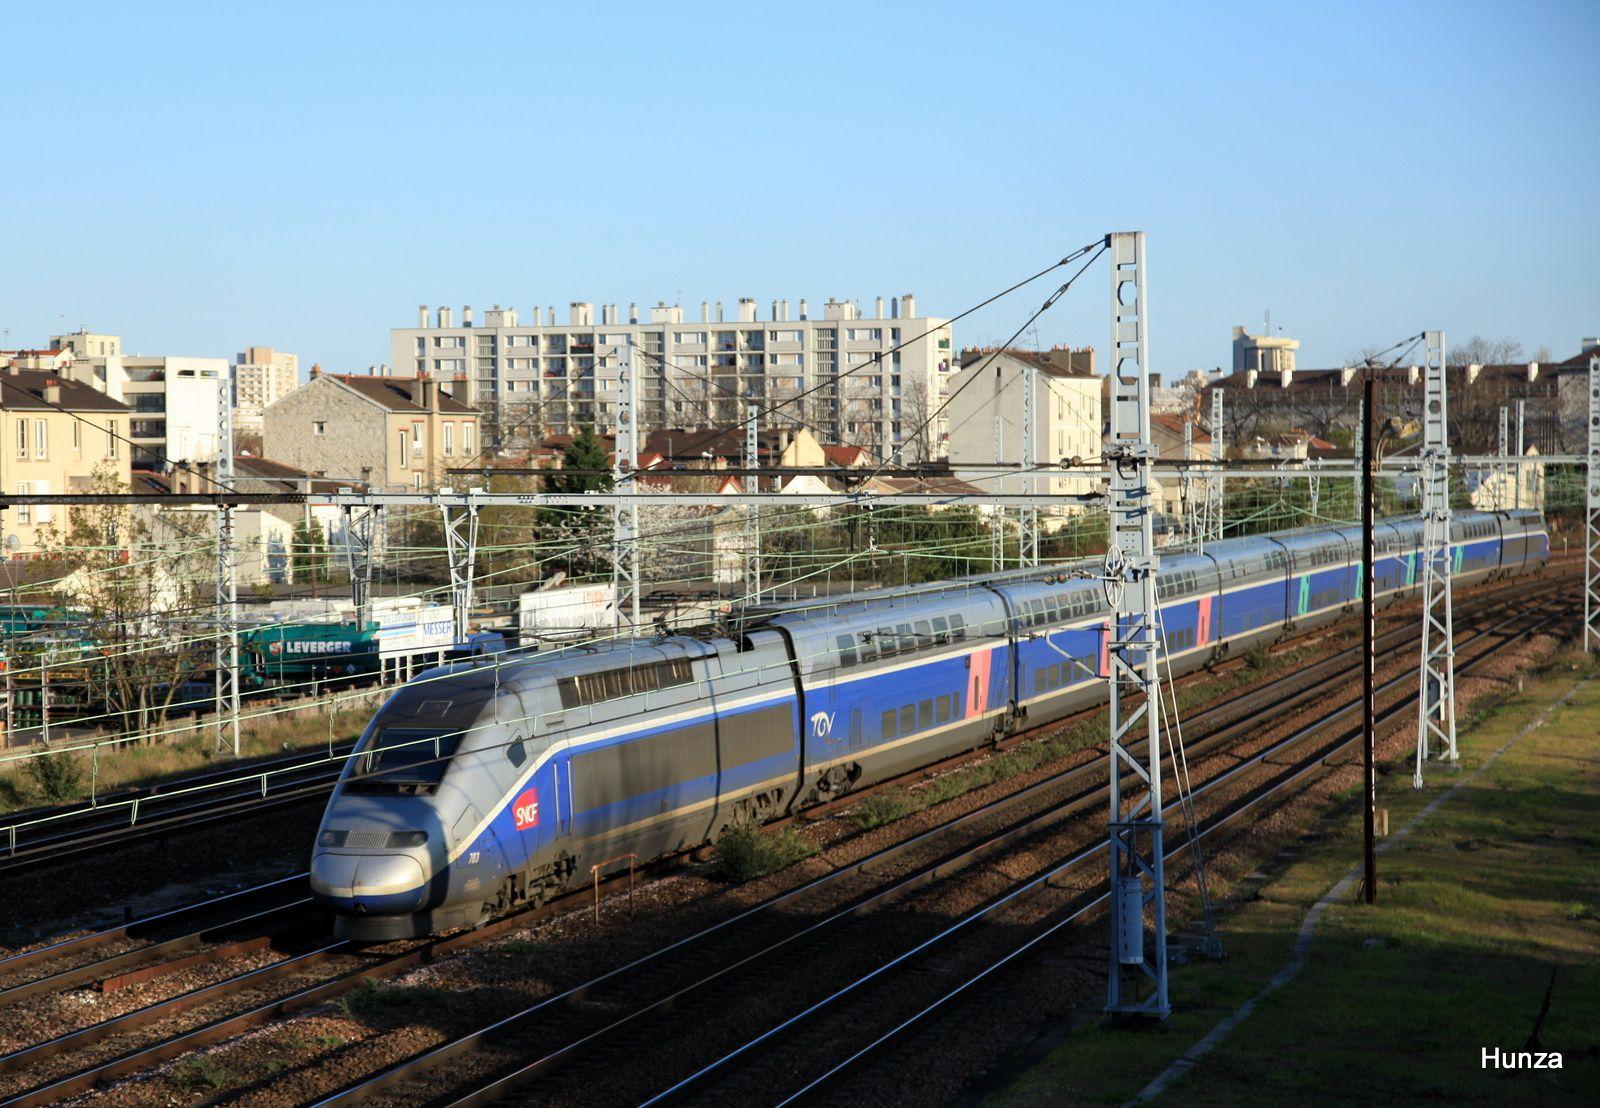 TGV n°6976 Annecy - Paris à Maisons Alfort-Alfortville (10 avril 2016) - rame n°703